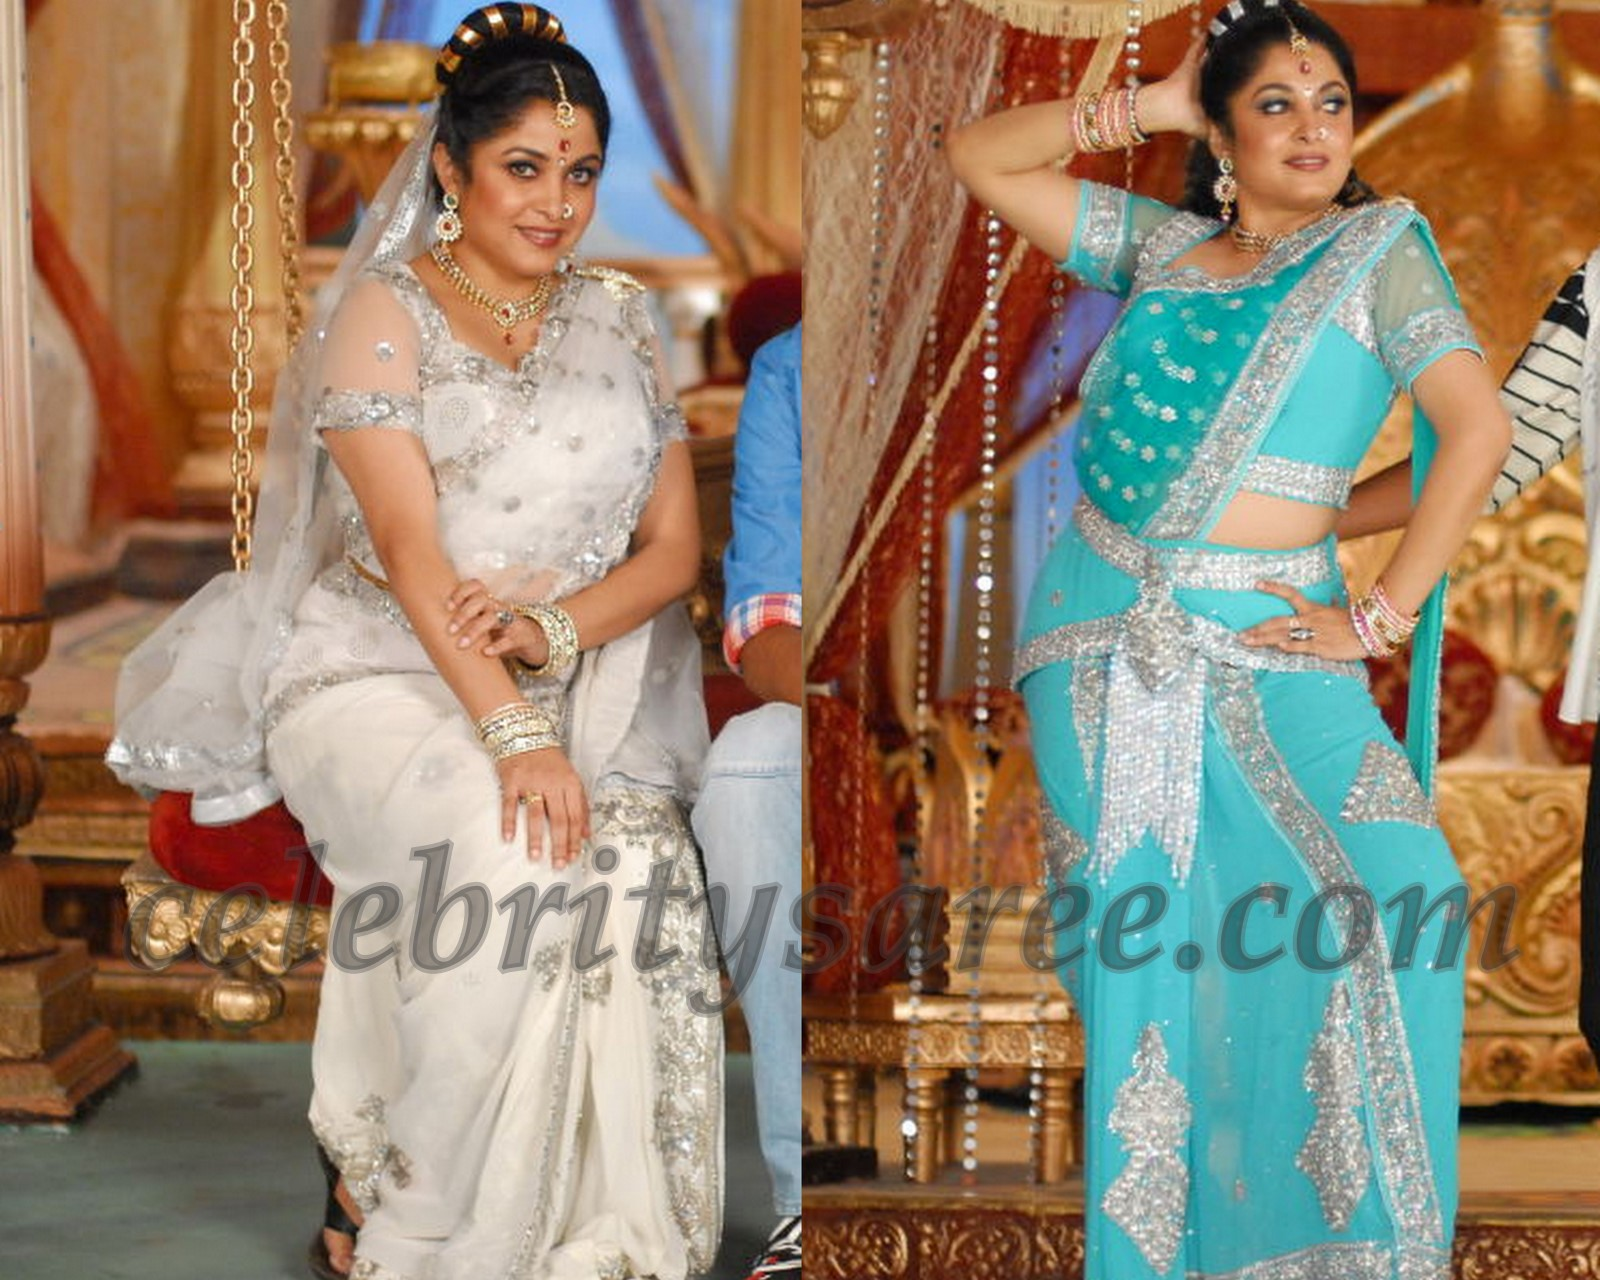 Ramya Krishna In Netted Blue And White Saris